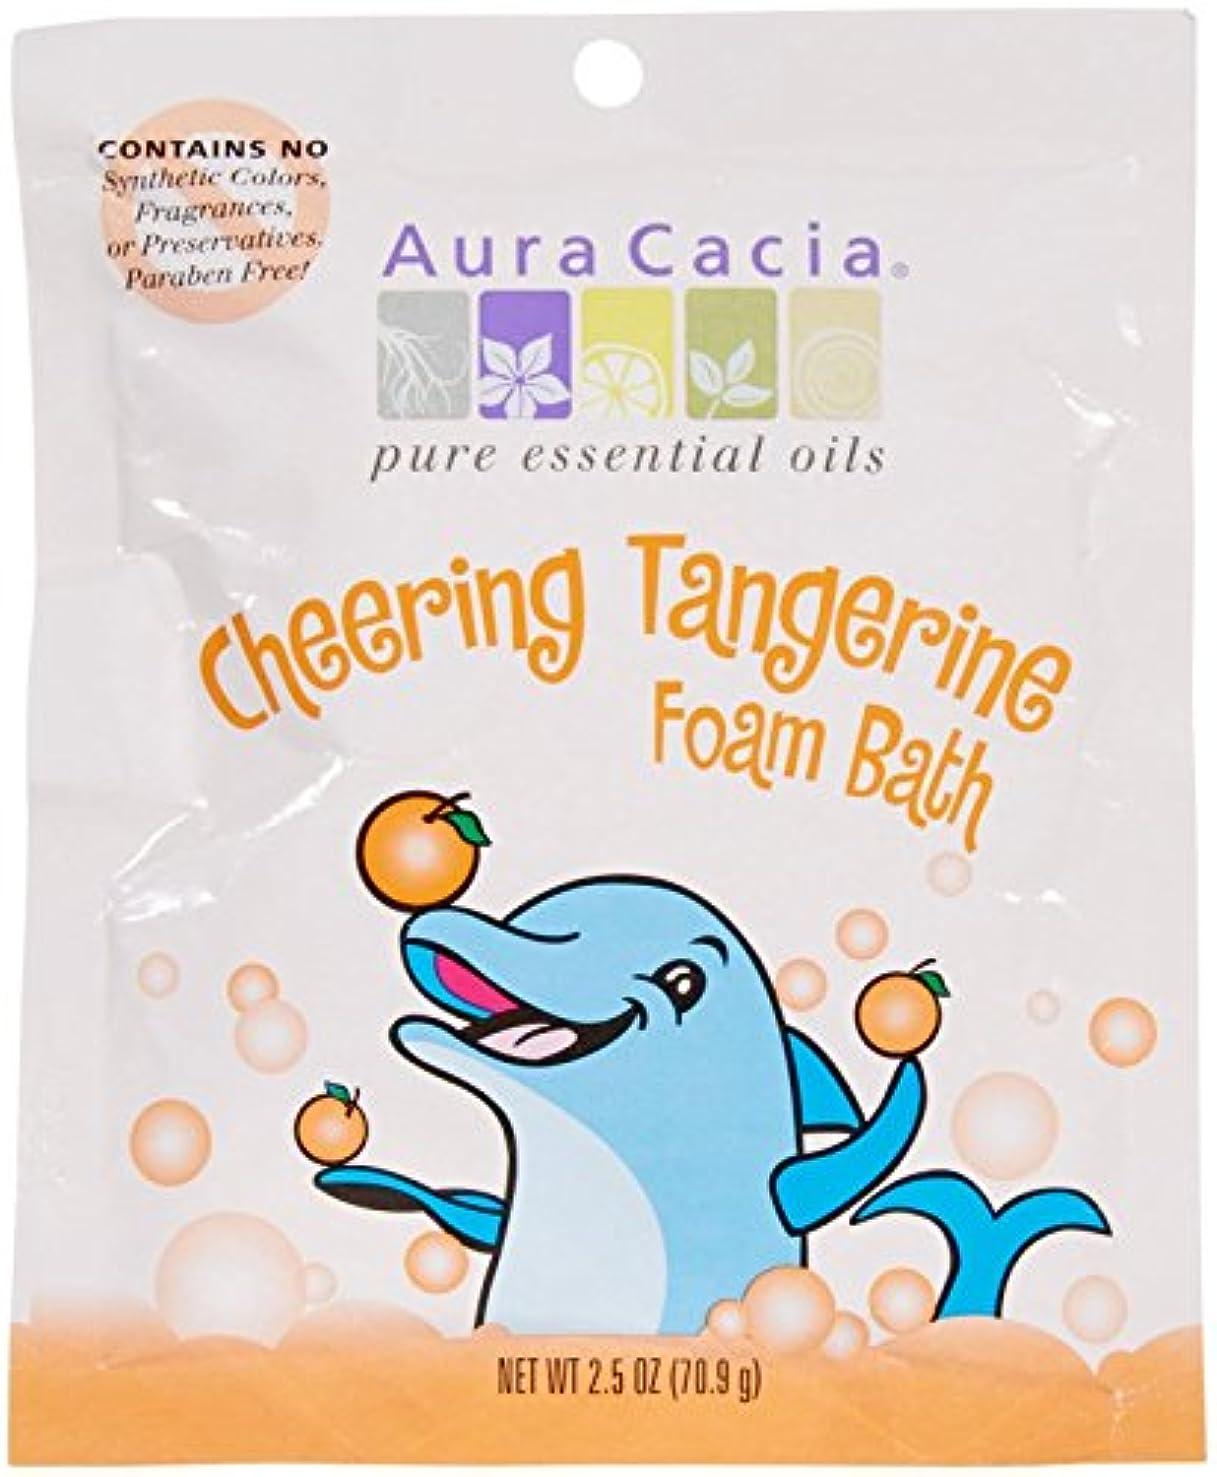 悲観主義者浴気性Aura Cacia, Cheering Foam Bath, Tangerine & Sweet Orange Essential Oils, 2.5 oz (70.9 g)